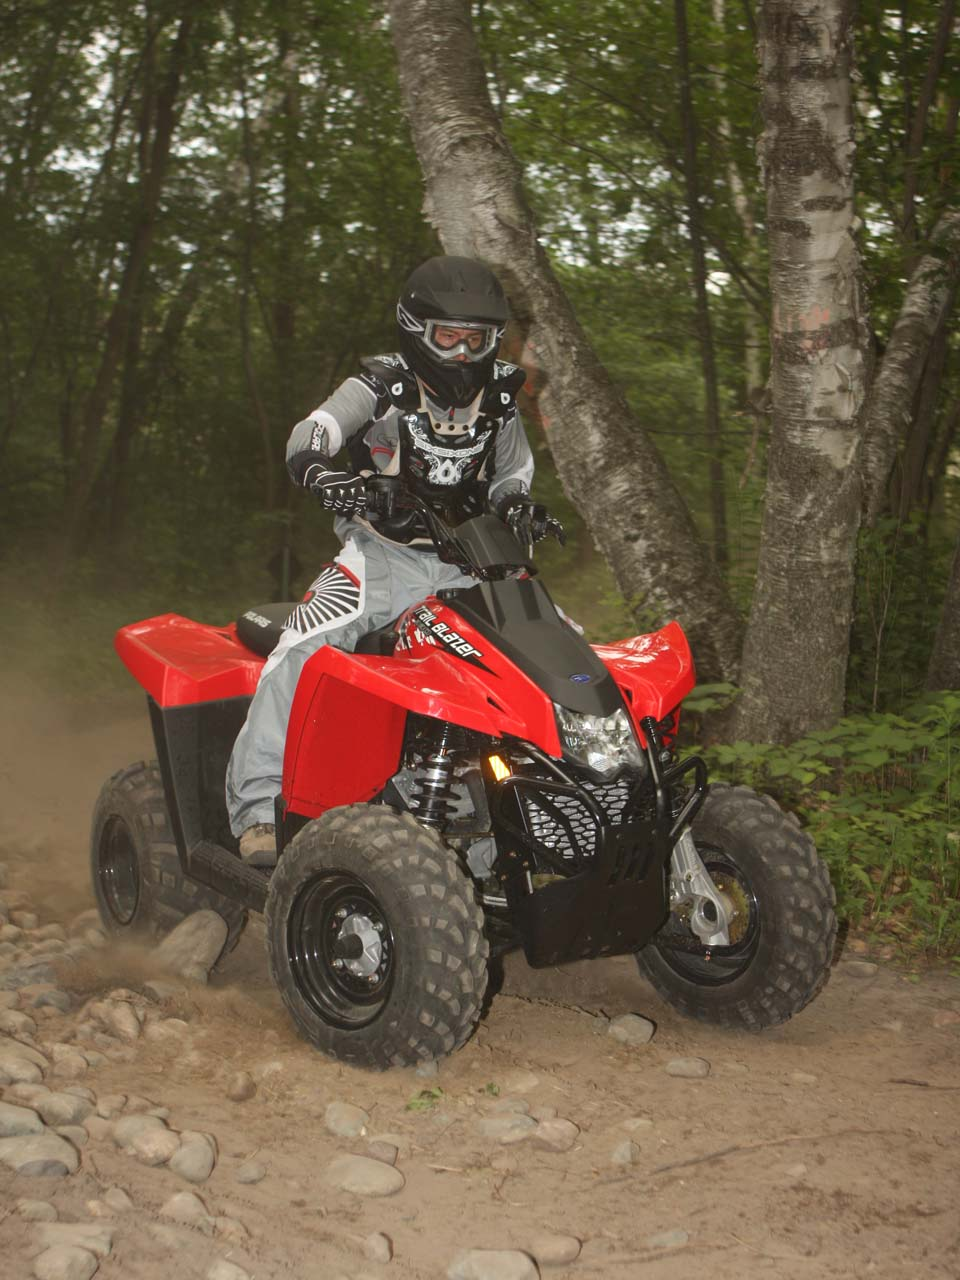 The Sporting Life - Mid-Sized Sport ATV Roundup | ATV